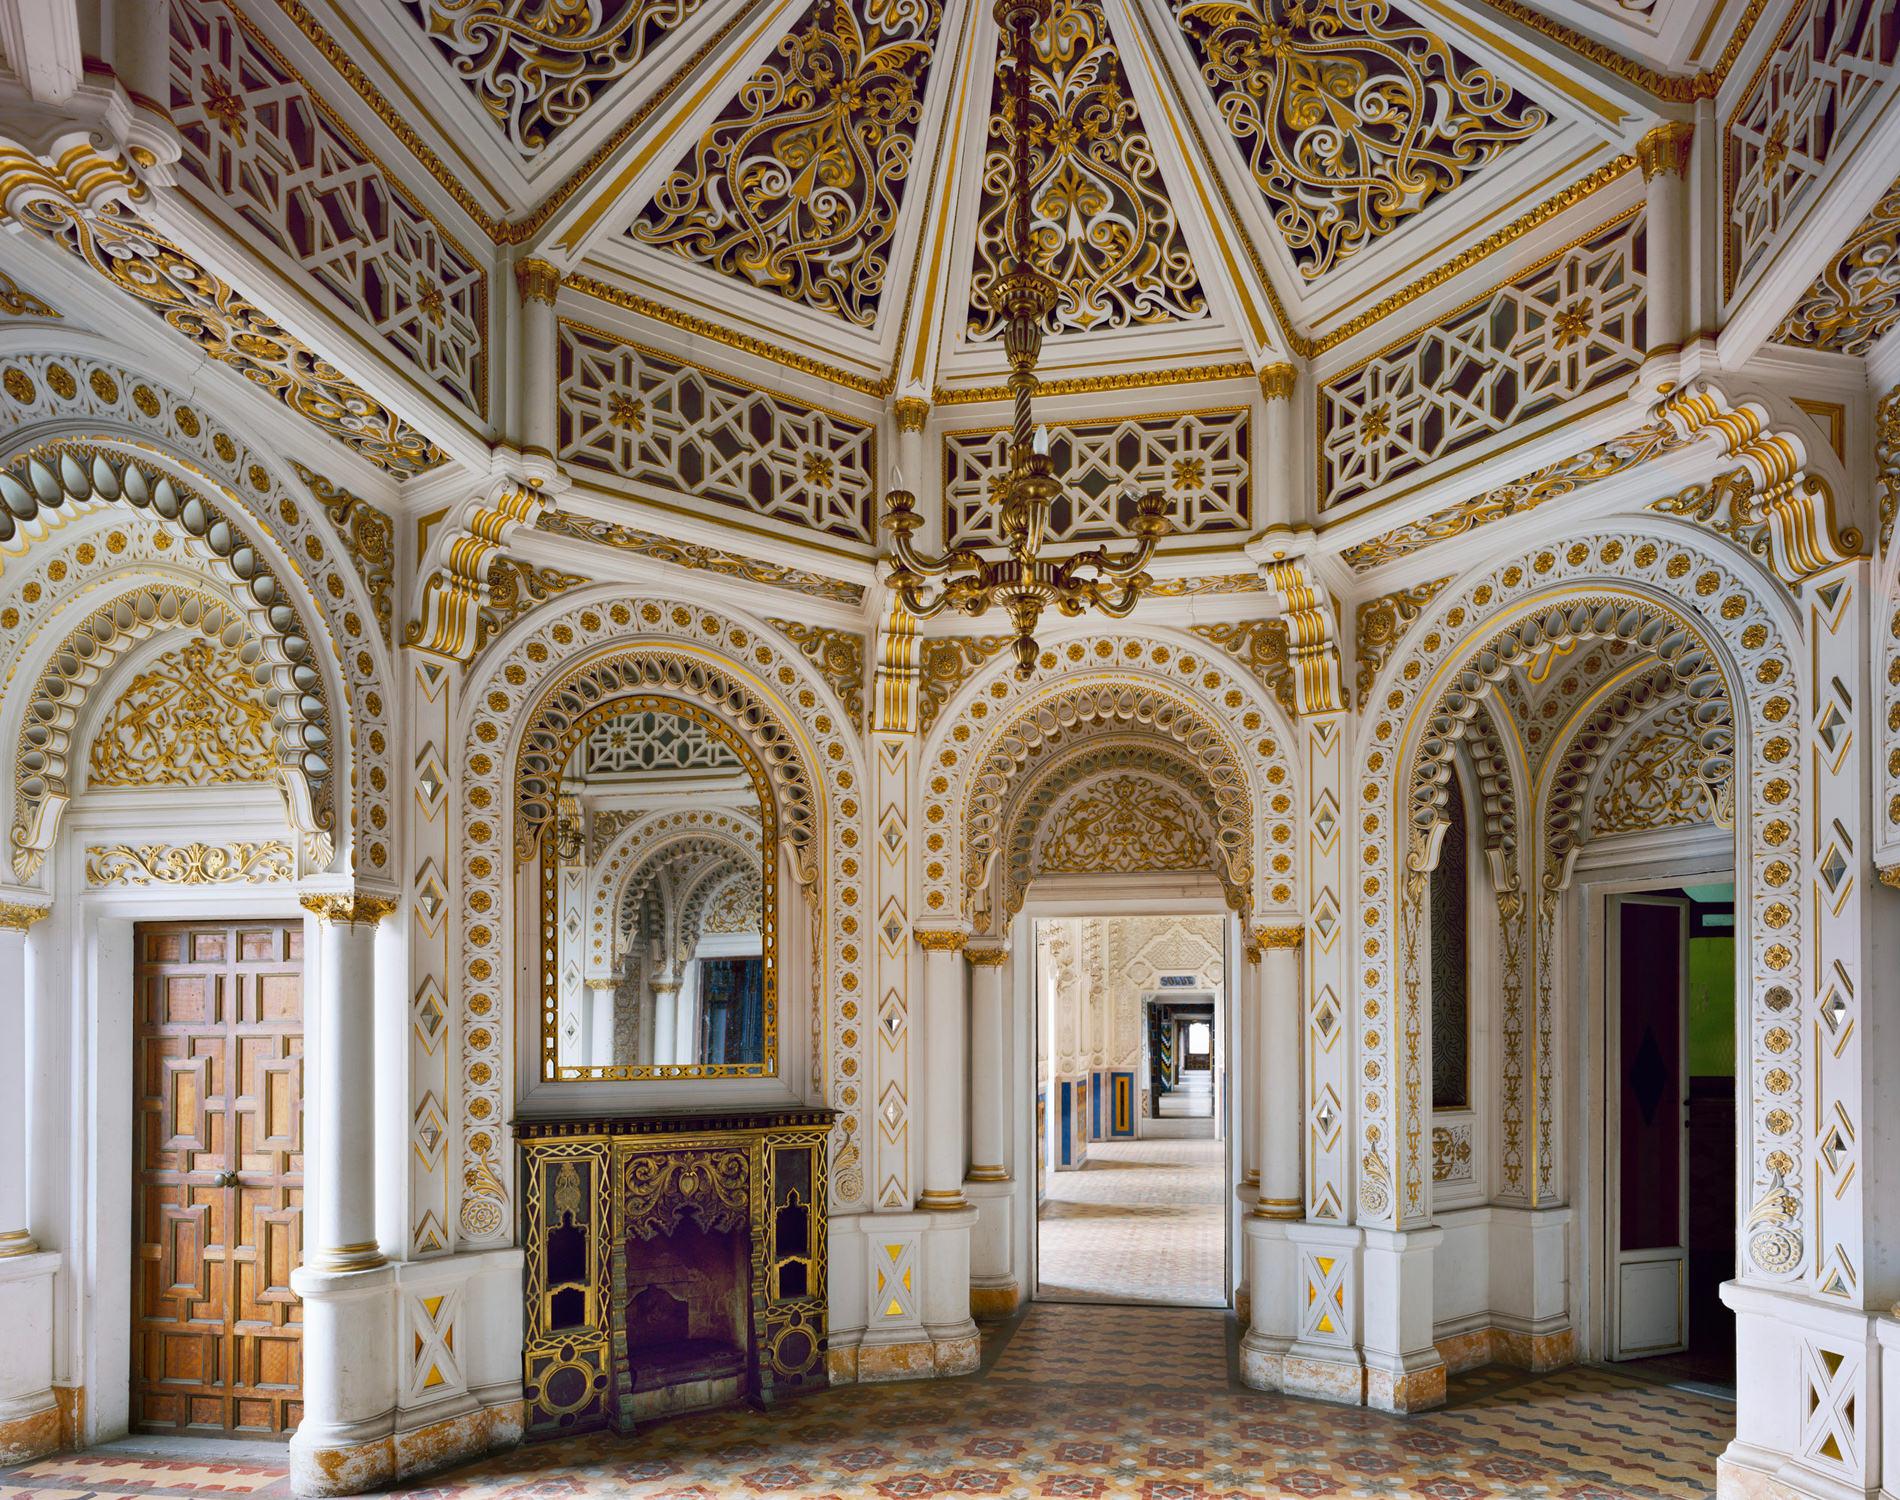 Ahmet Ertug — Castello Di Sammezzano, Florence